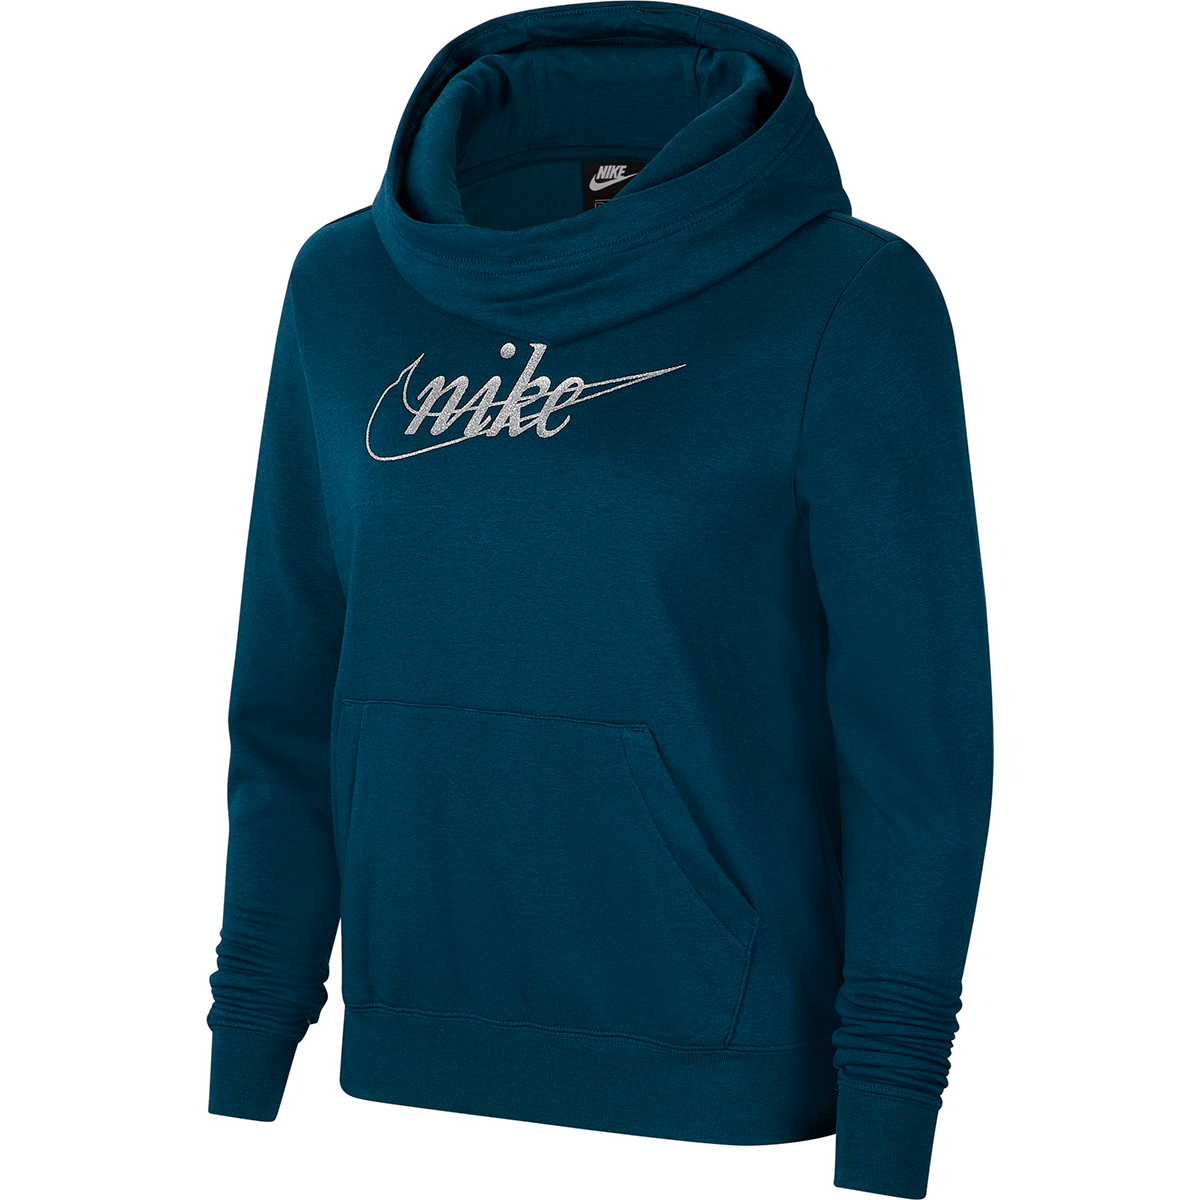 Nike Women's Glitter Logo Pullover Hoodie - Blue, S